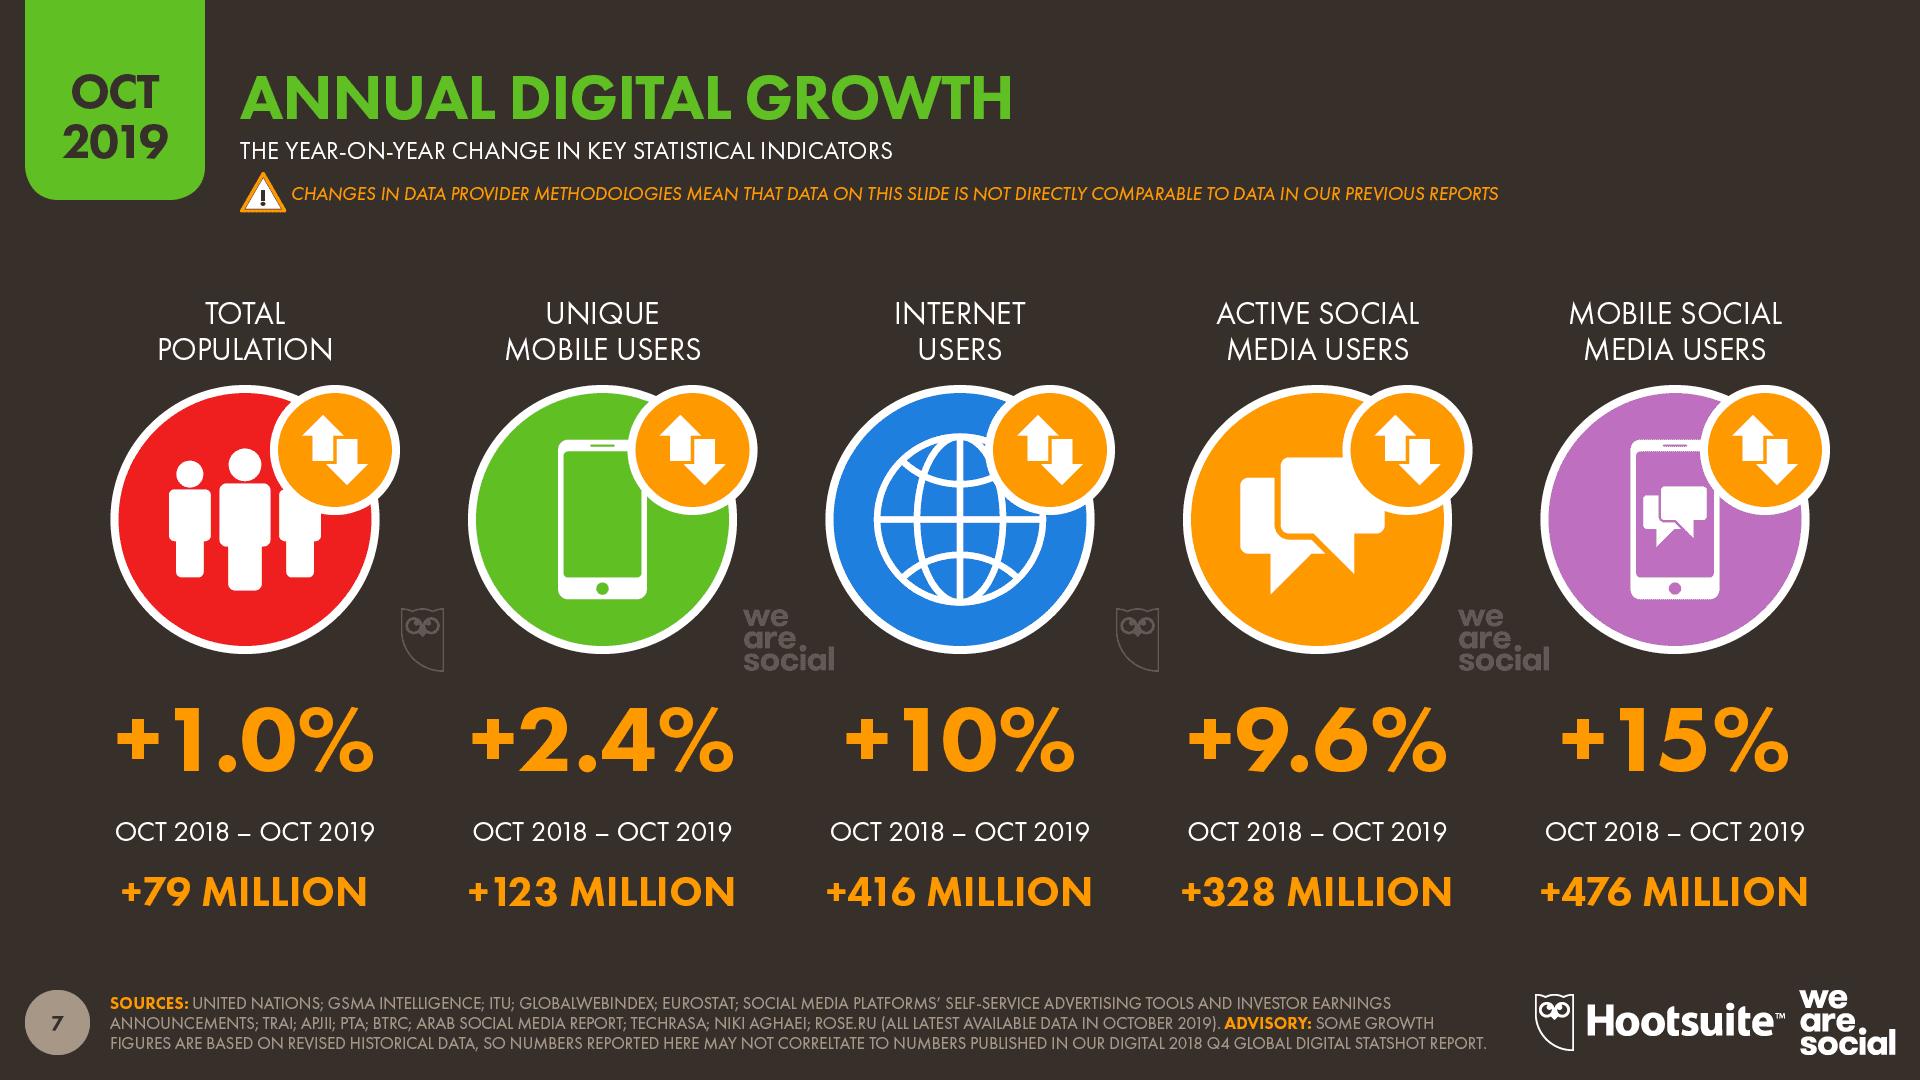 Digital 2019 Q4 Global Digital Statshot